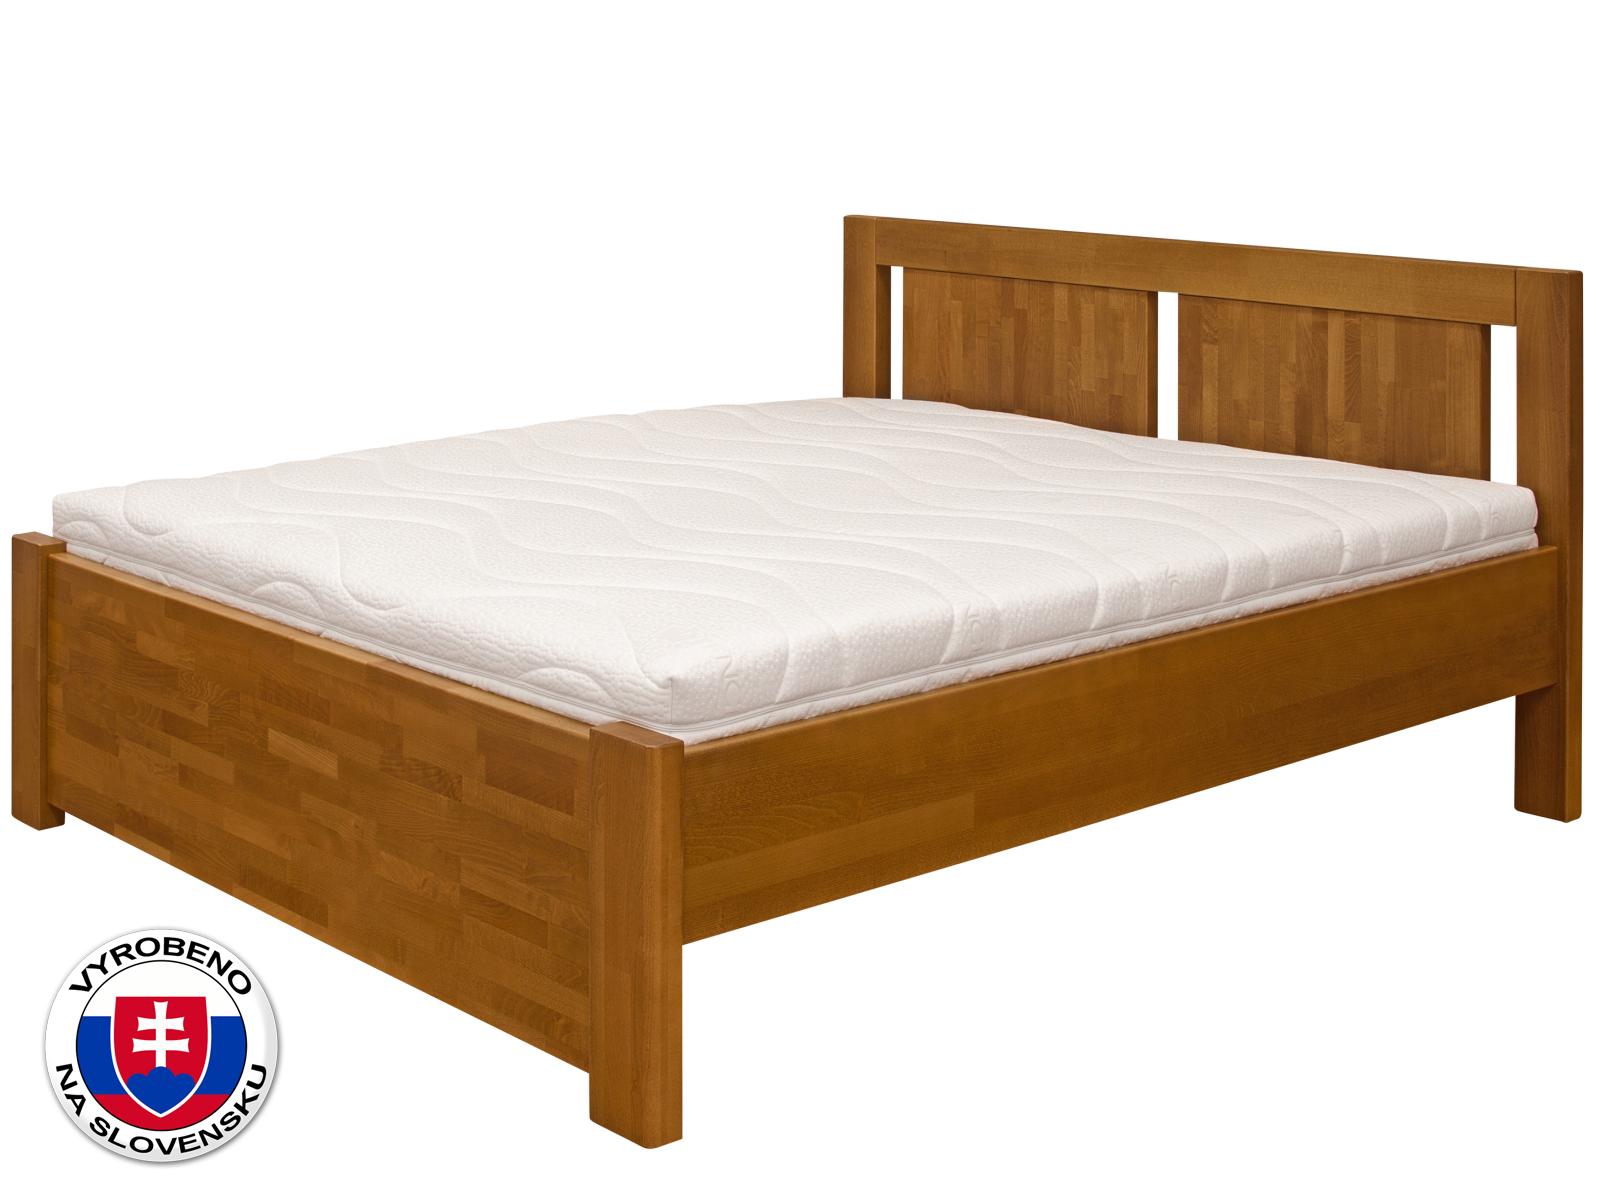 Manželská postel 180 cm - Purtex - Viktoria (masiv)